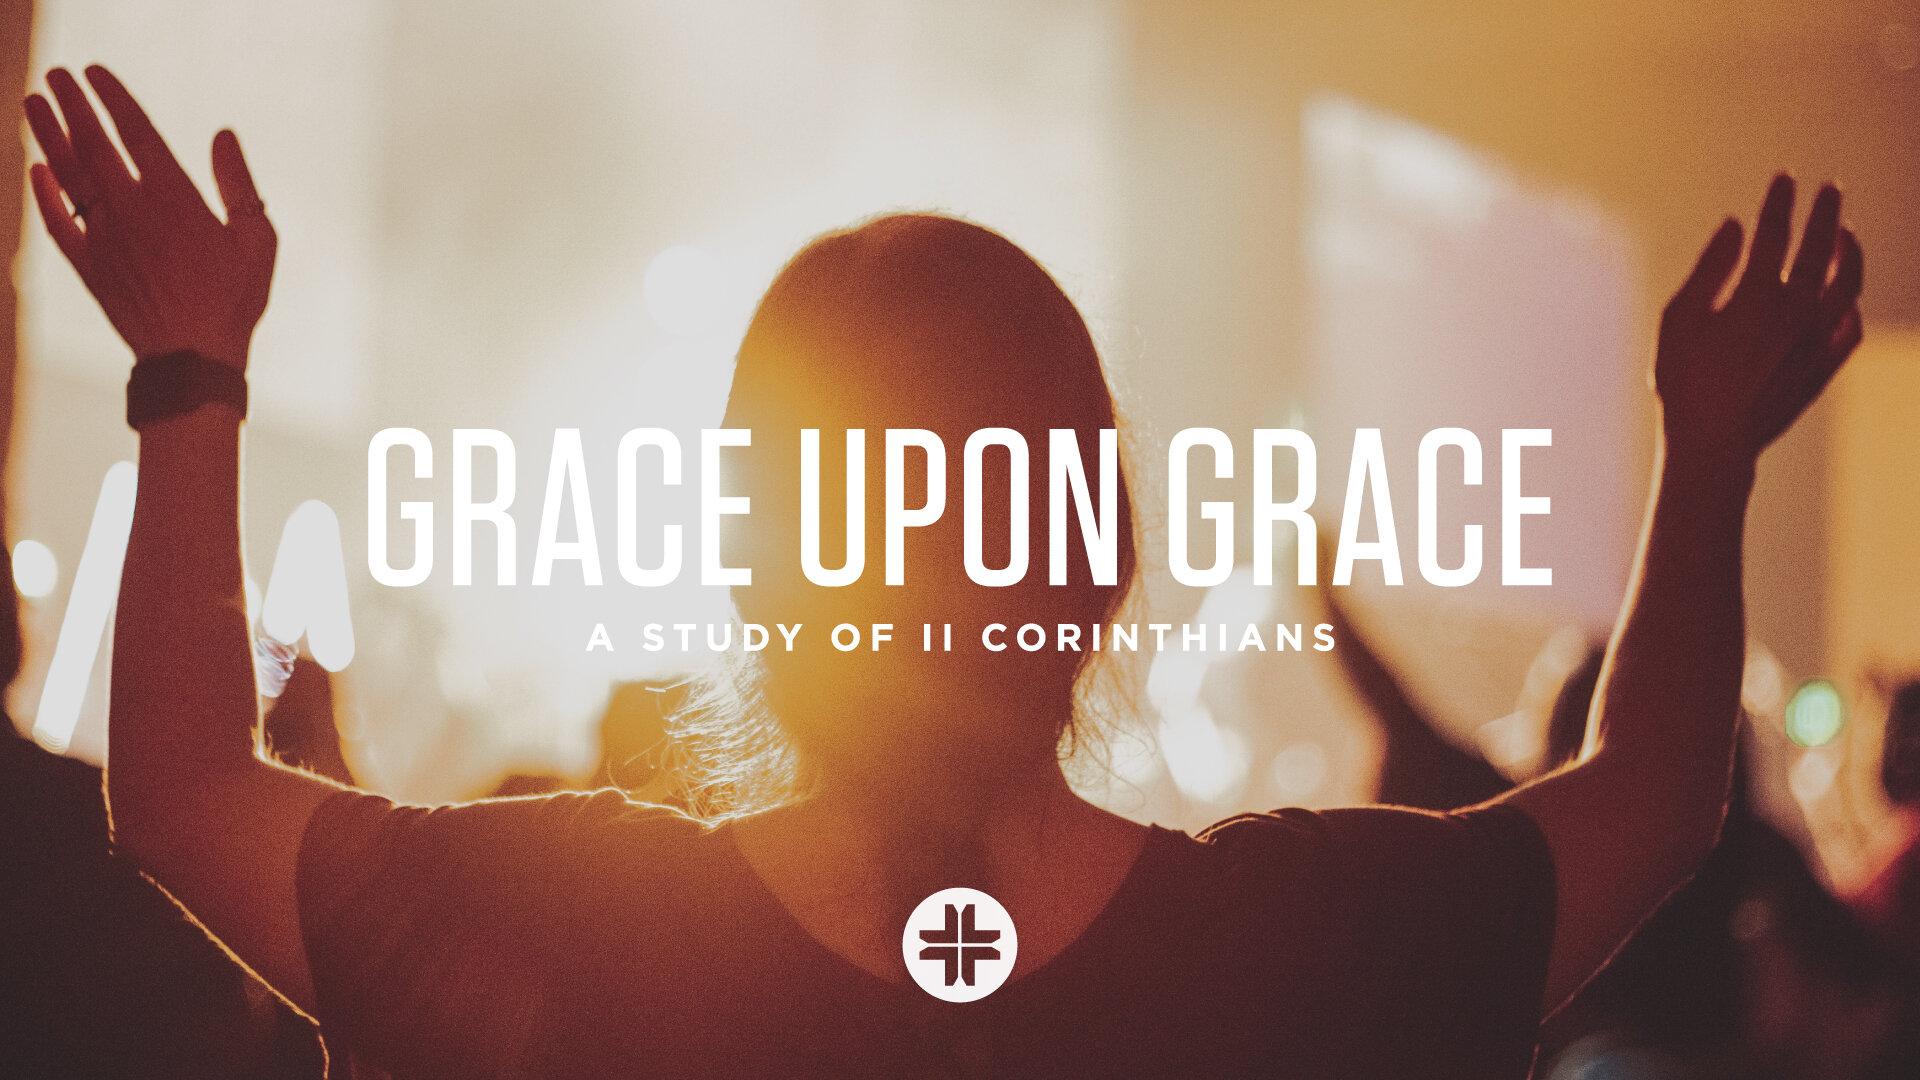 GraceUponGrace_WEB.jpg